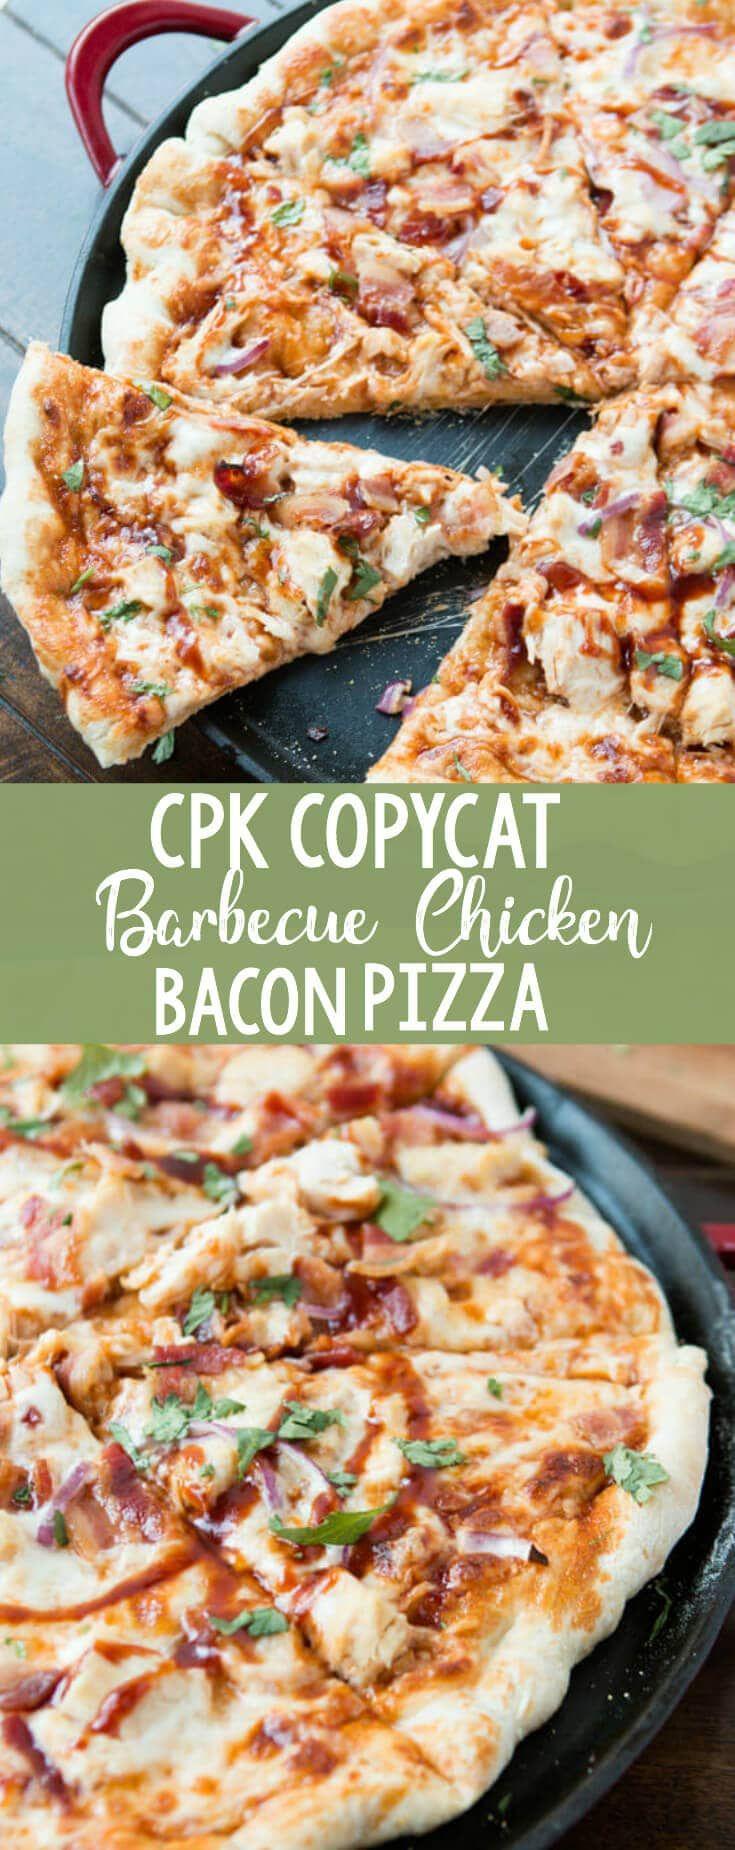 Photo of Copycat California Pizza Kitchen BBQ Chicken Bacon Pizza